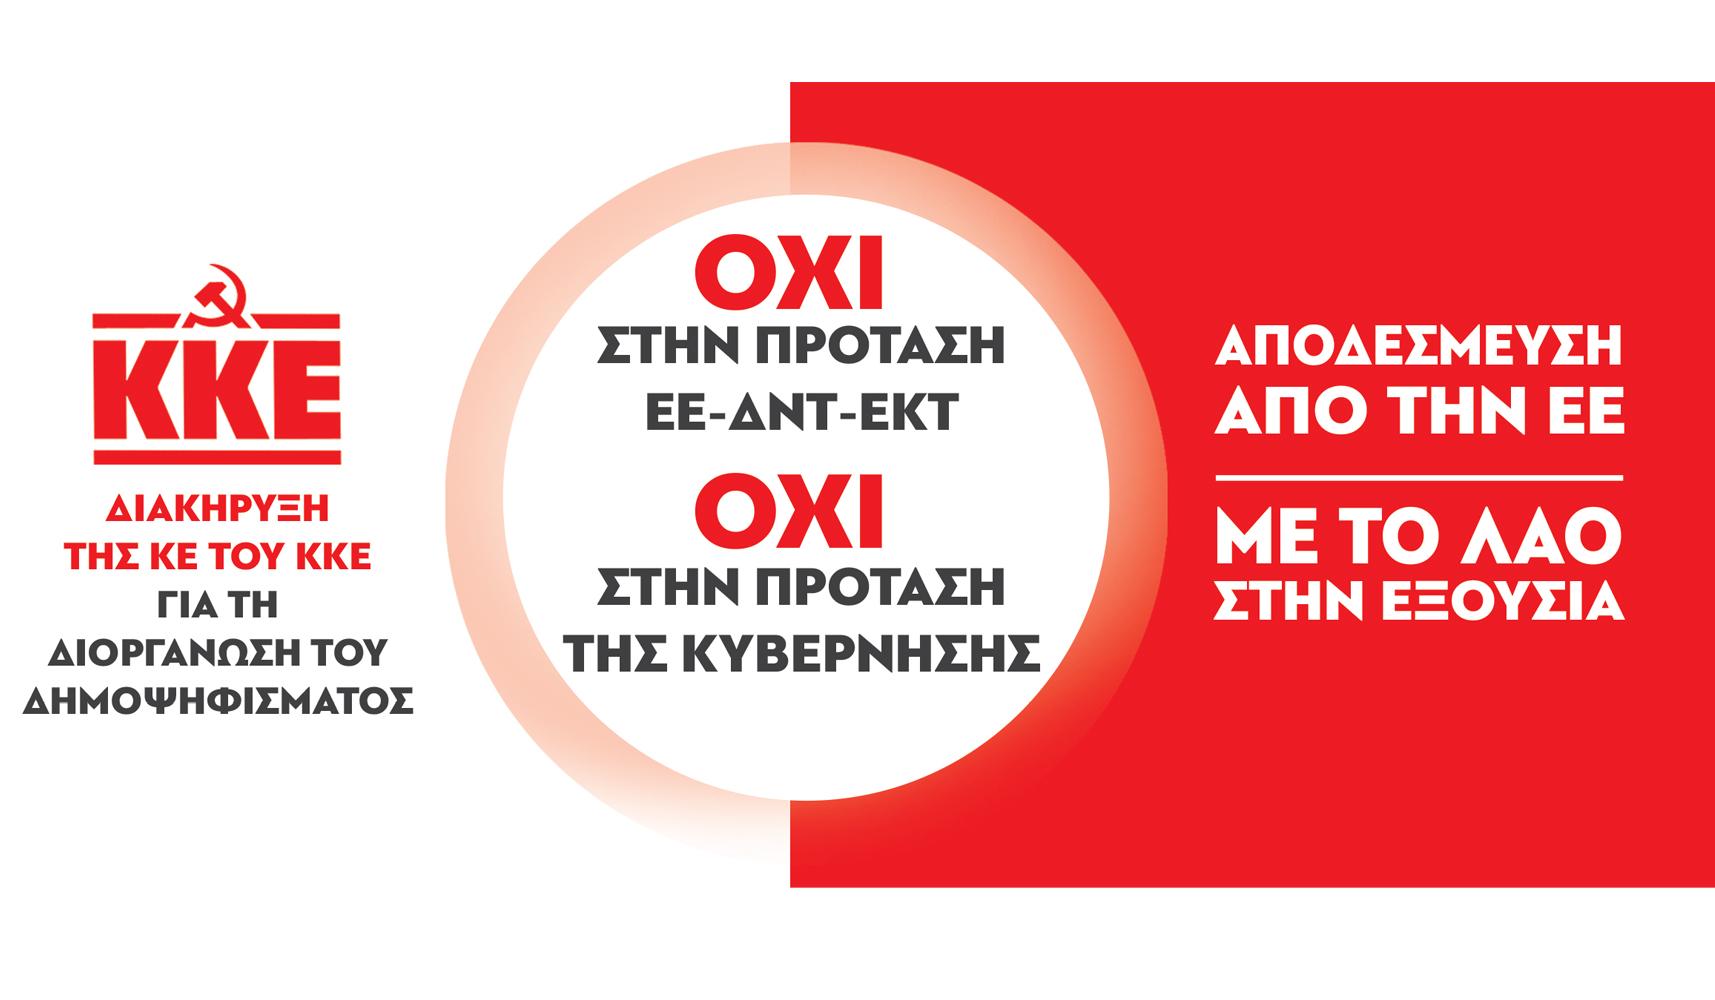 diakhryksh-oxi-kke